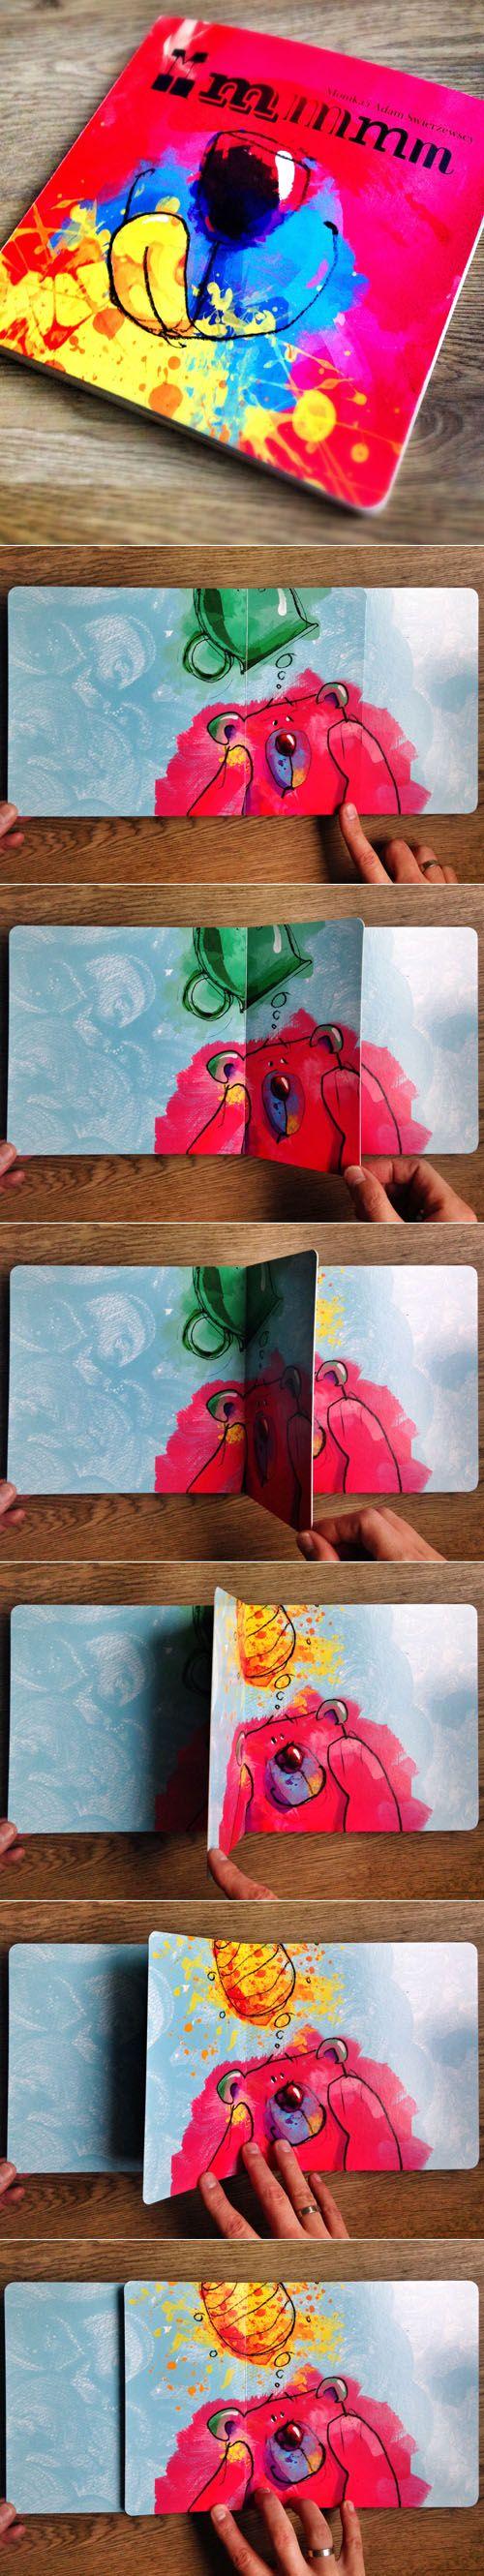 Our new book for children. Kids / books / design / illustrations.  for more  bobom.pl, www.eneduerabe.redcart.pl